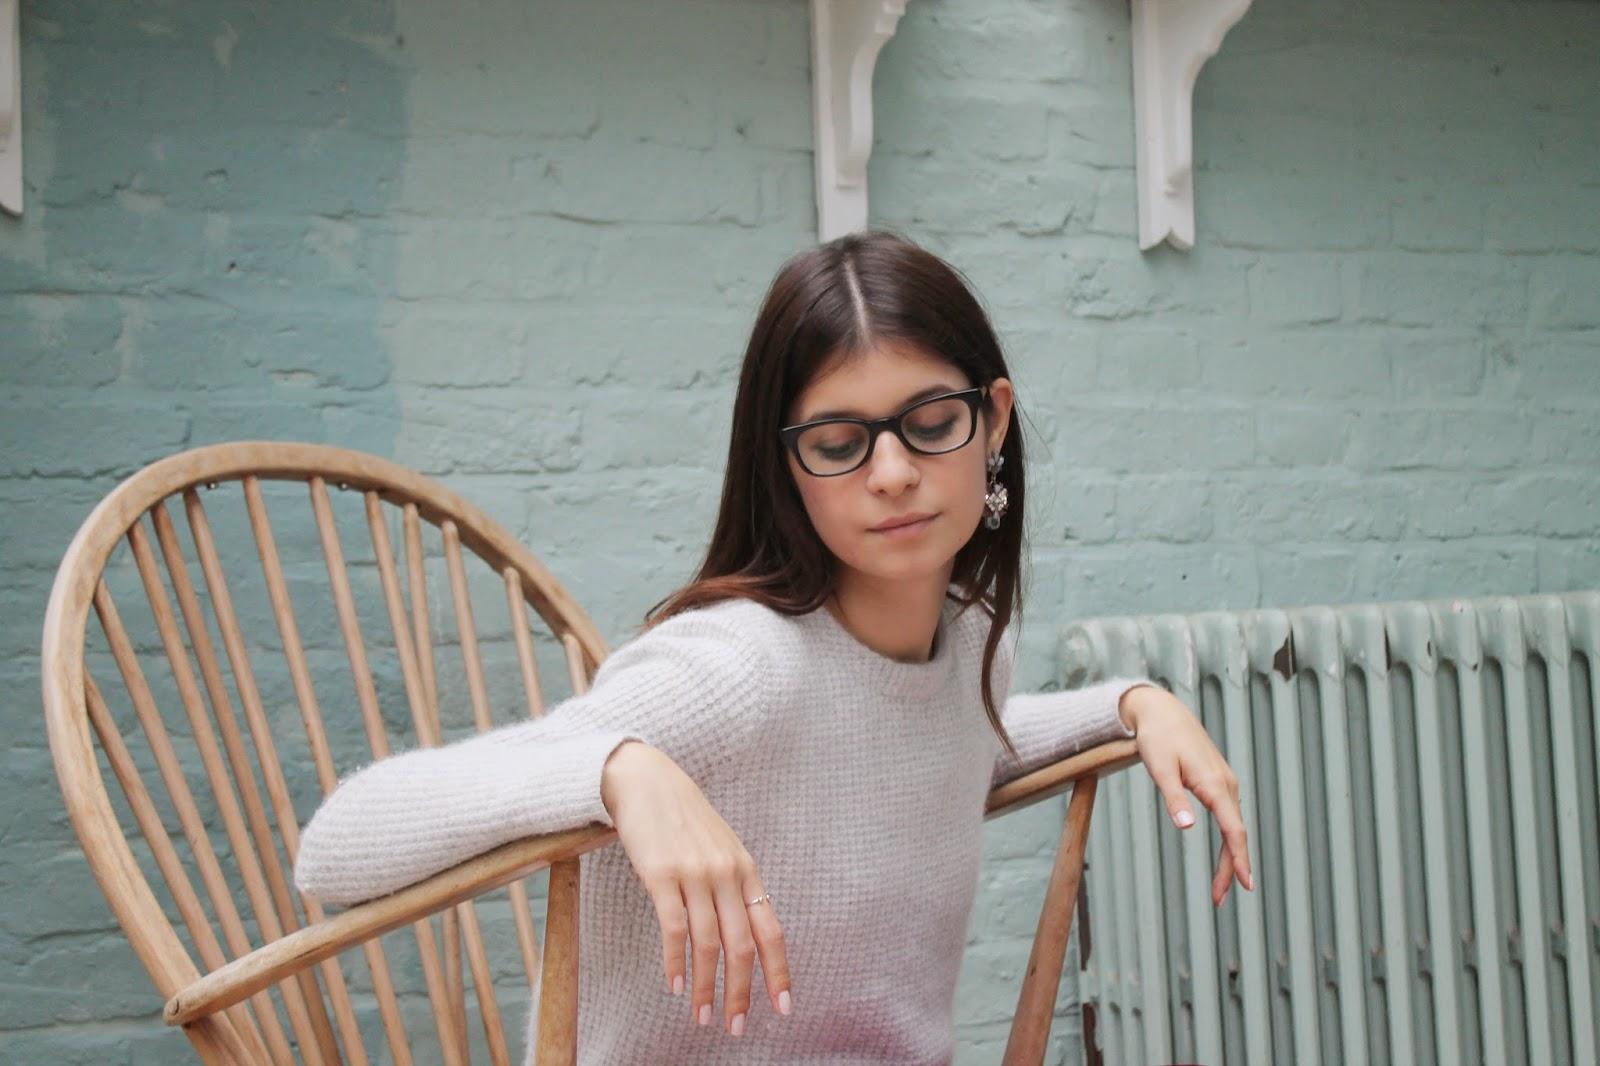 portrait, glasses, geeky, statement earrings, knit, fluffy, wooly